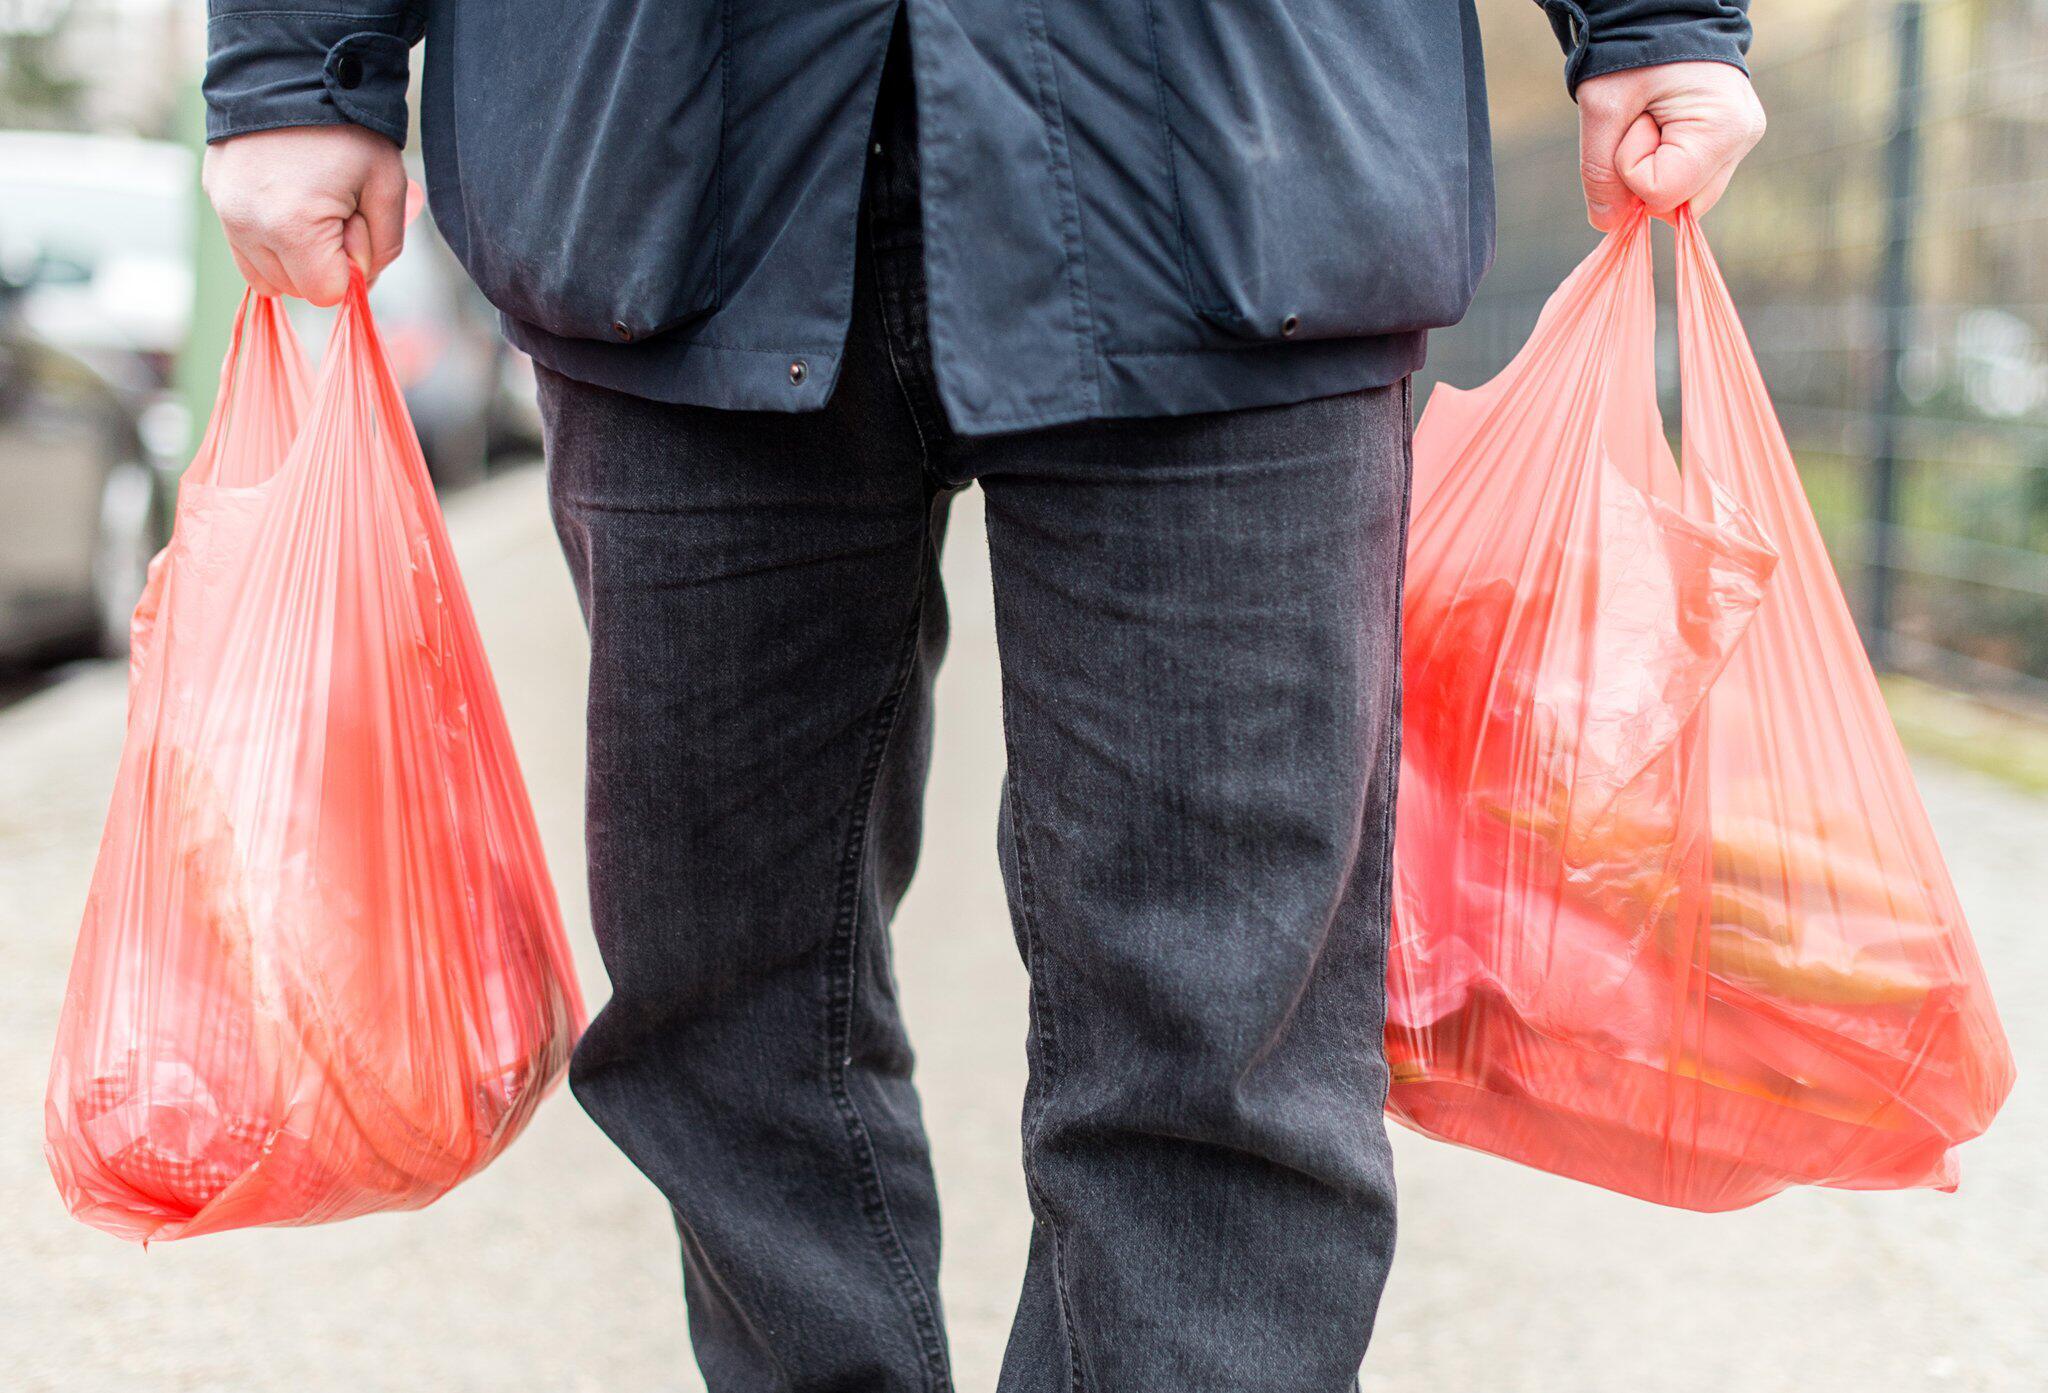 Bild zu Einkäufe in Plastiktüten